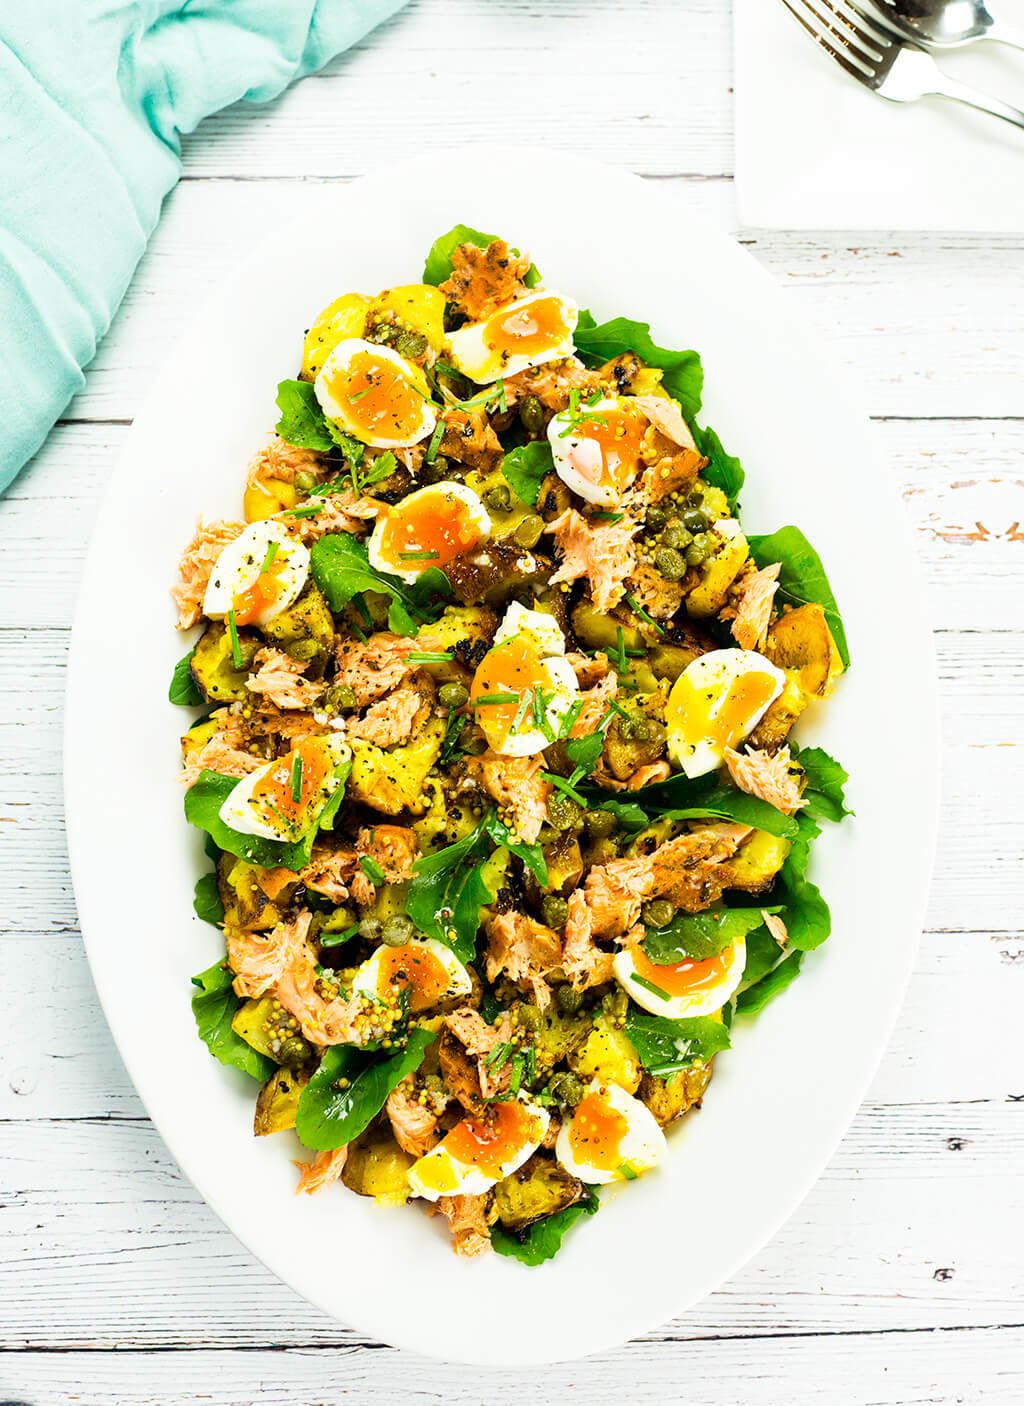 Hot Smoked Salmon Salad with Egg & Mustard Potatoes